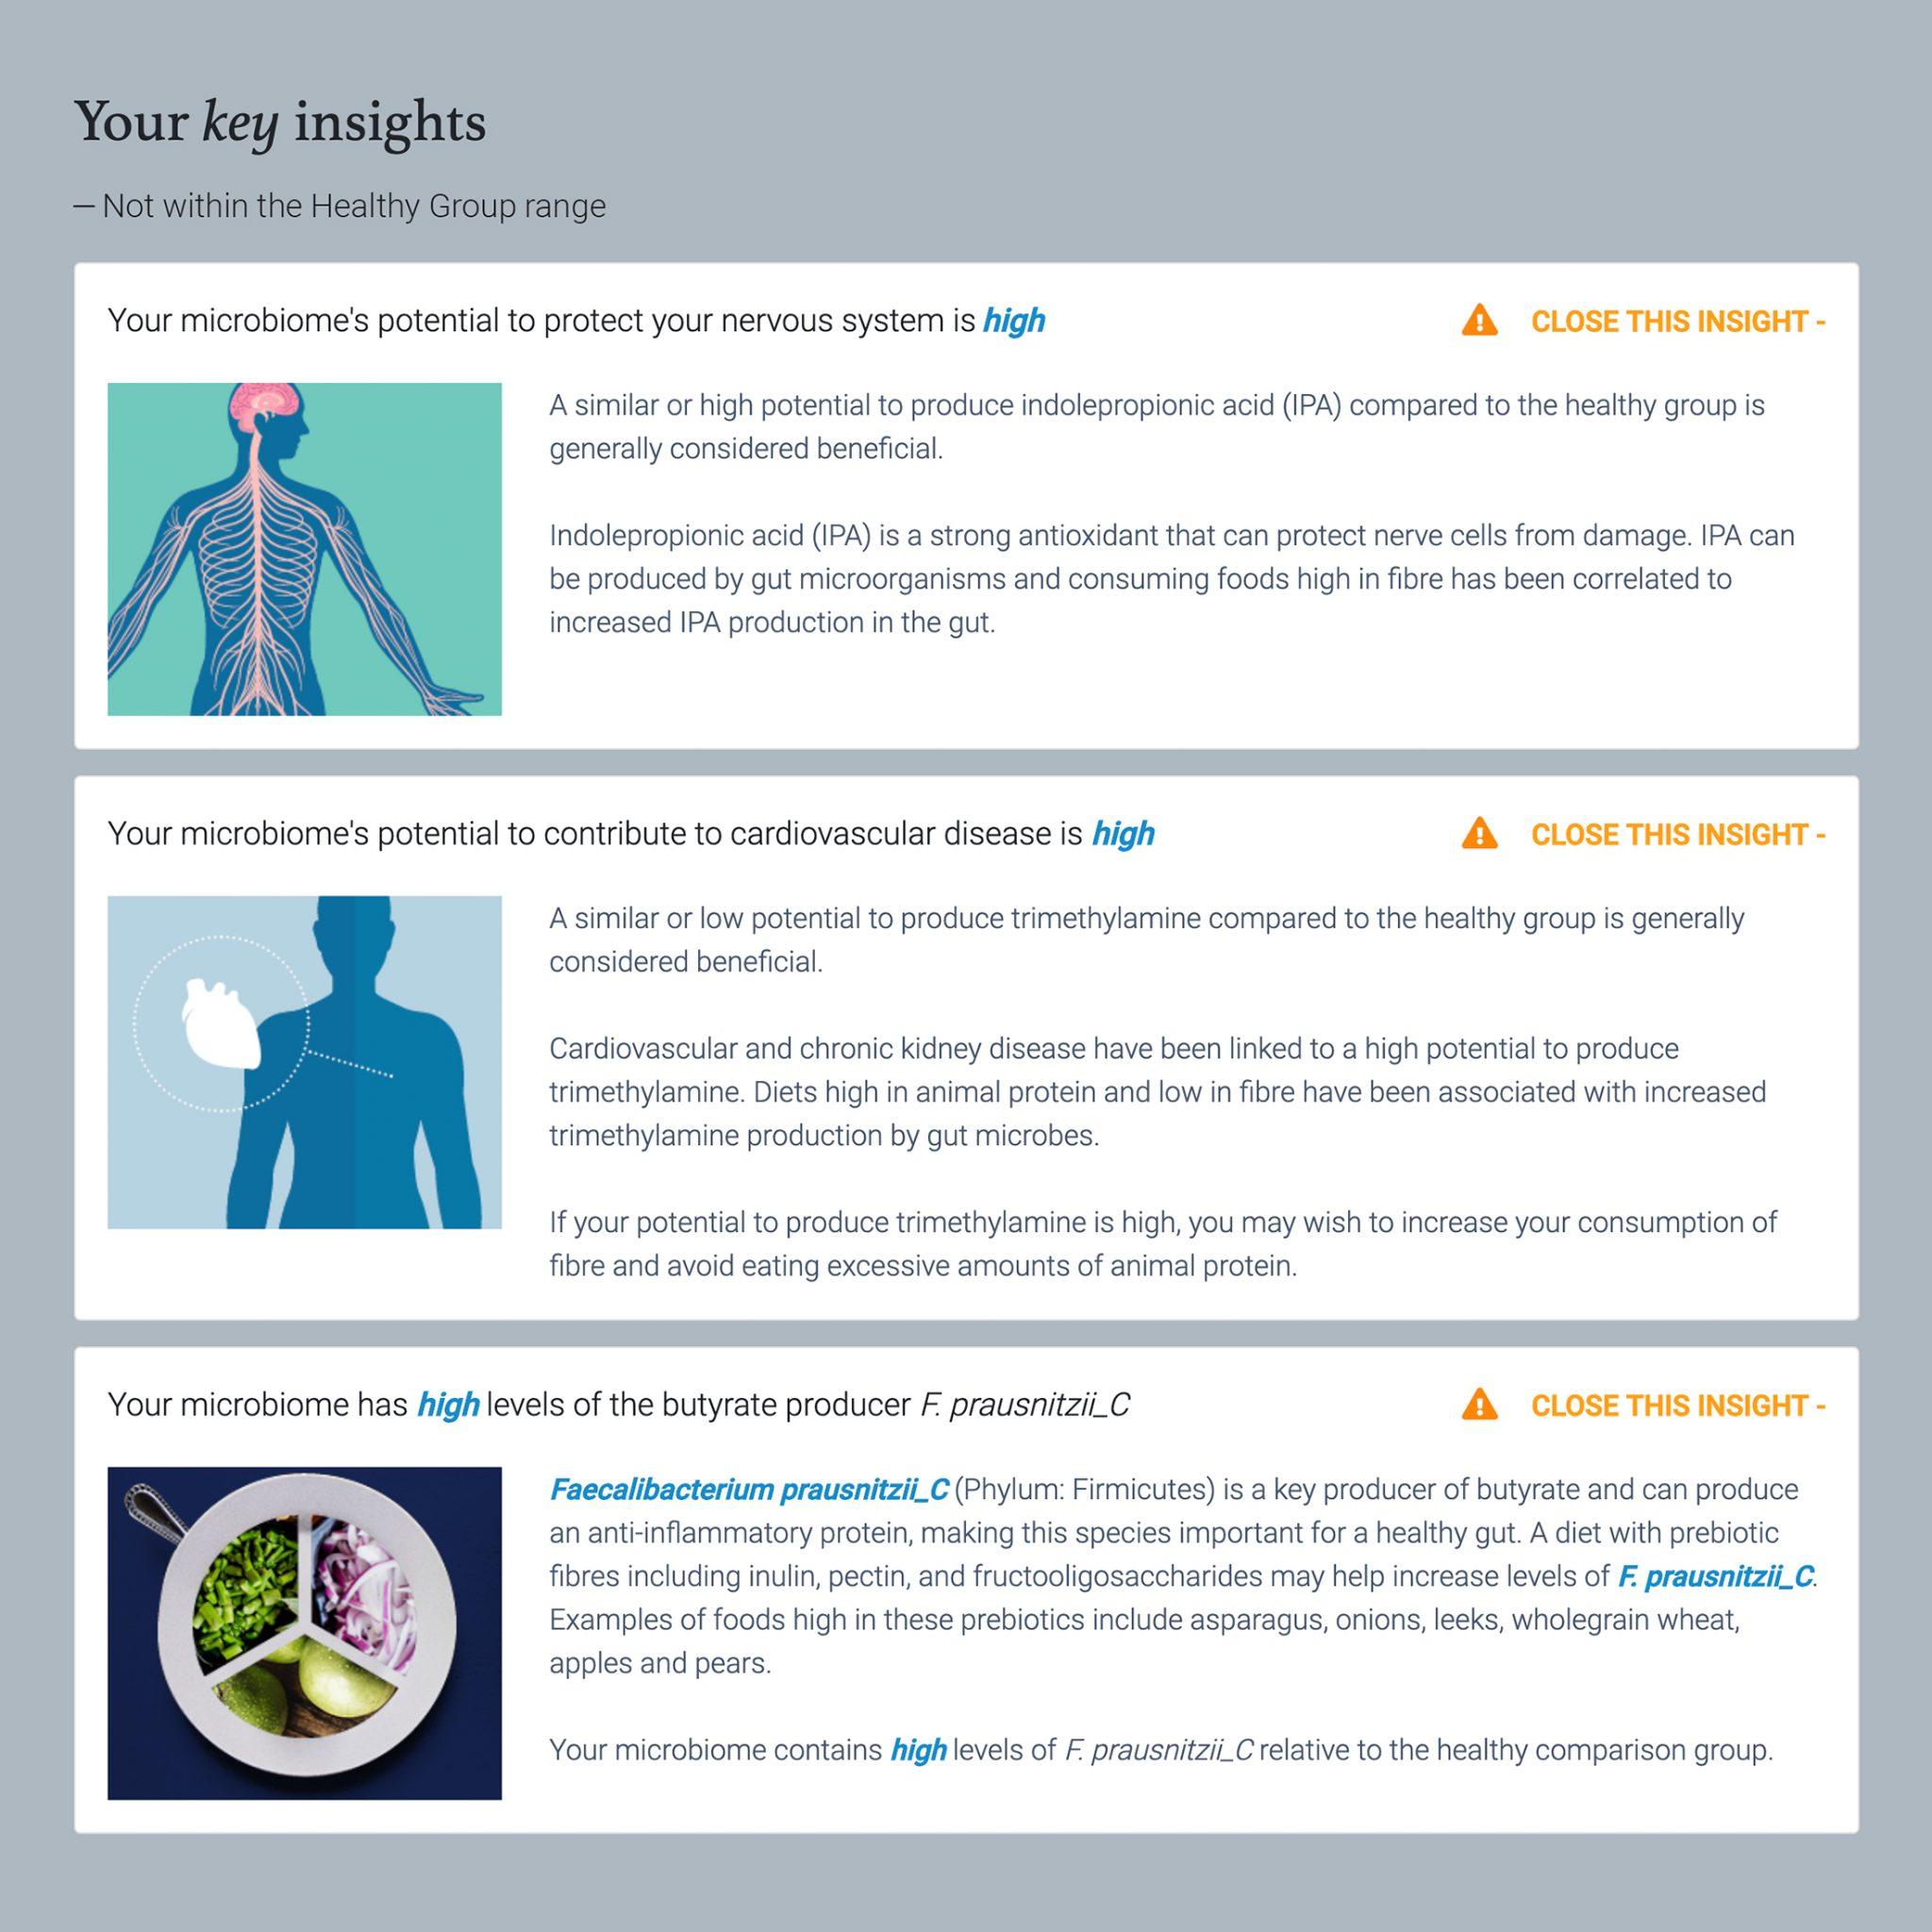 Microba insight report analysis